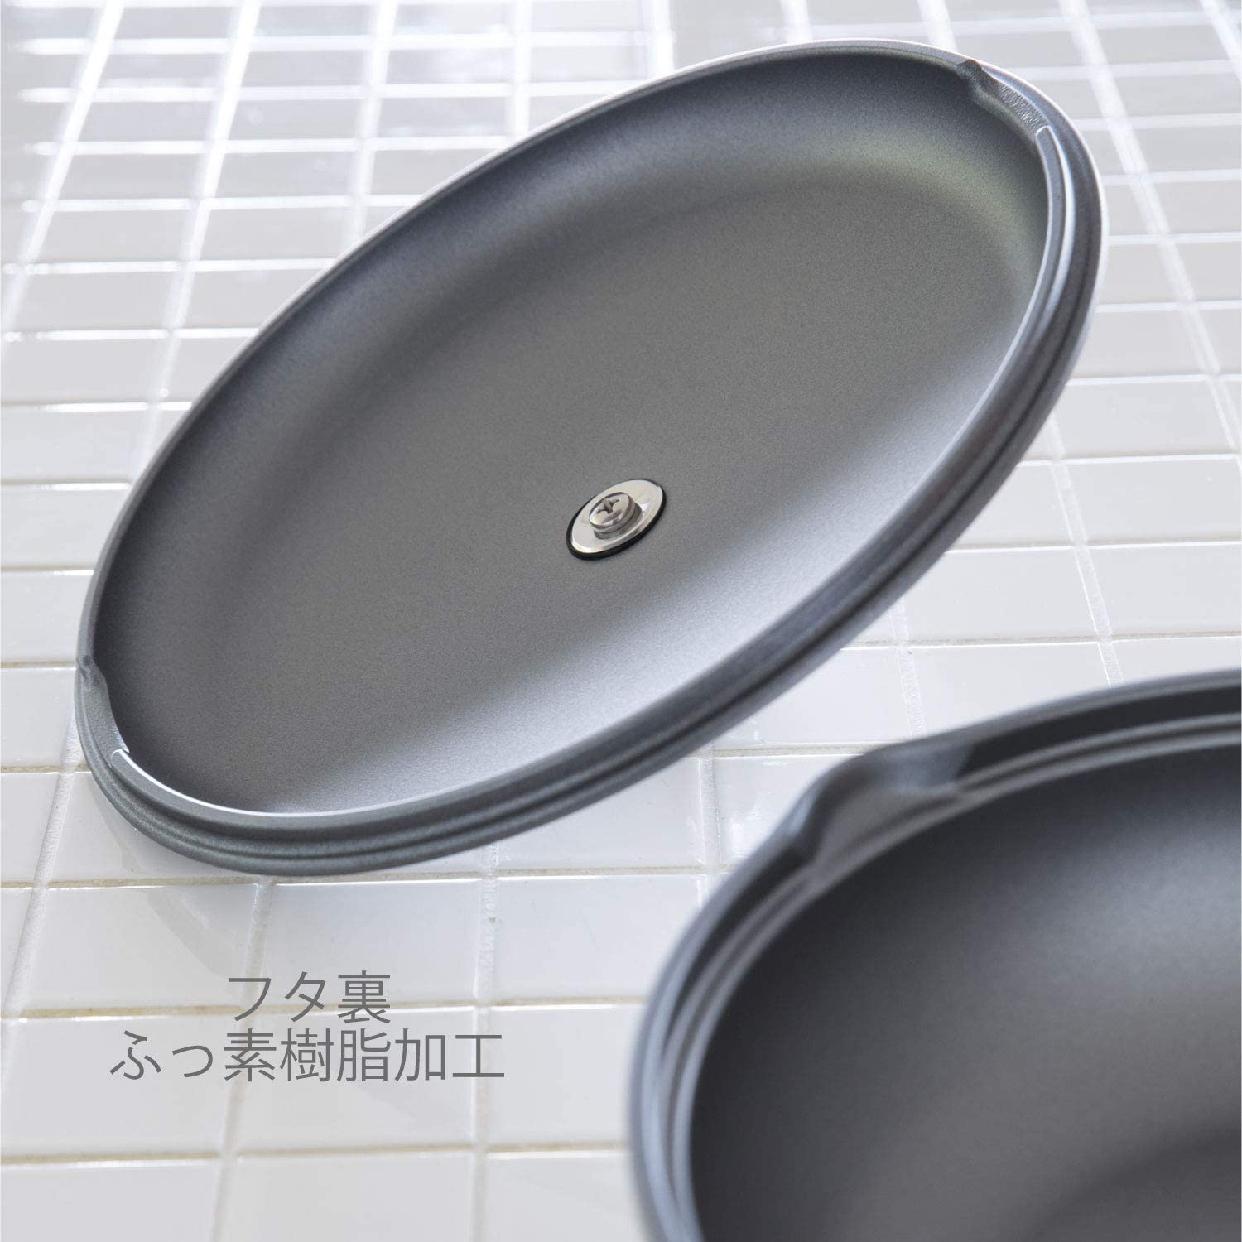 HALムスイ(ハルムスイ) 万能無水鍋23の商品画像3